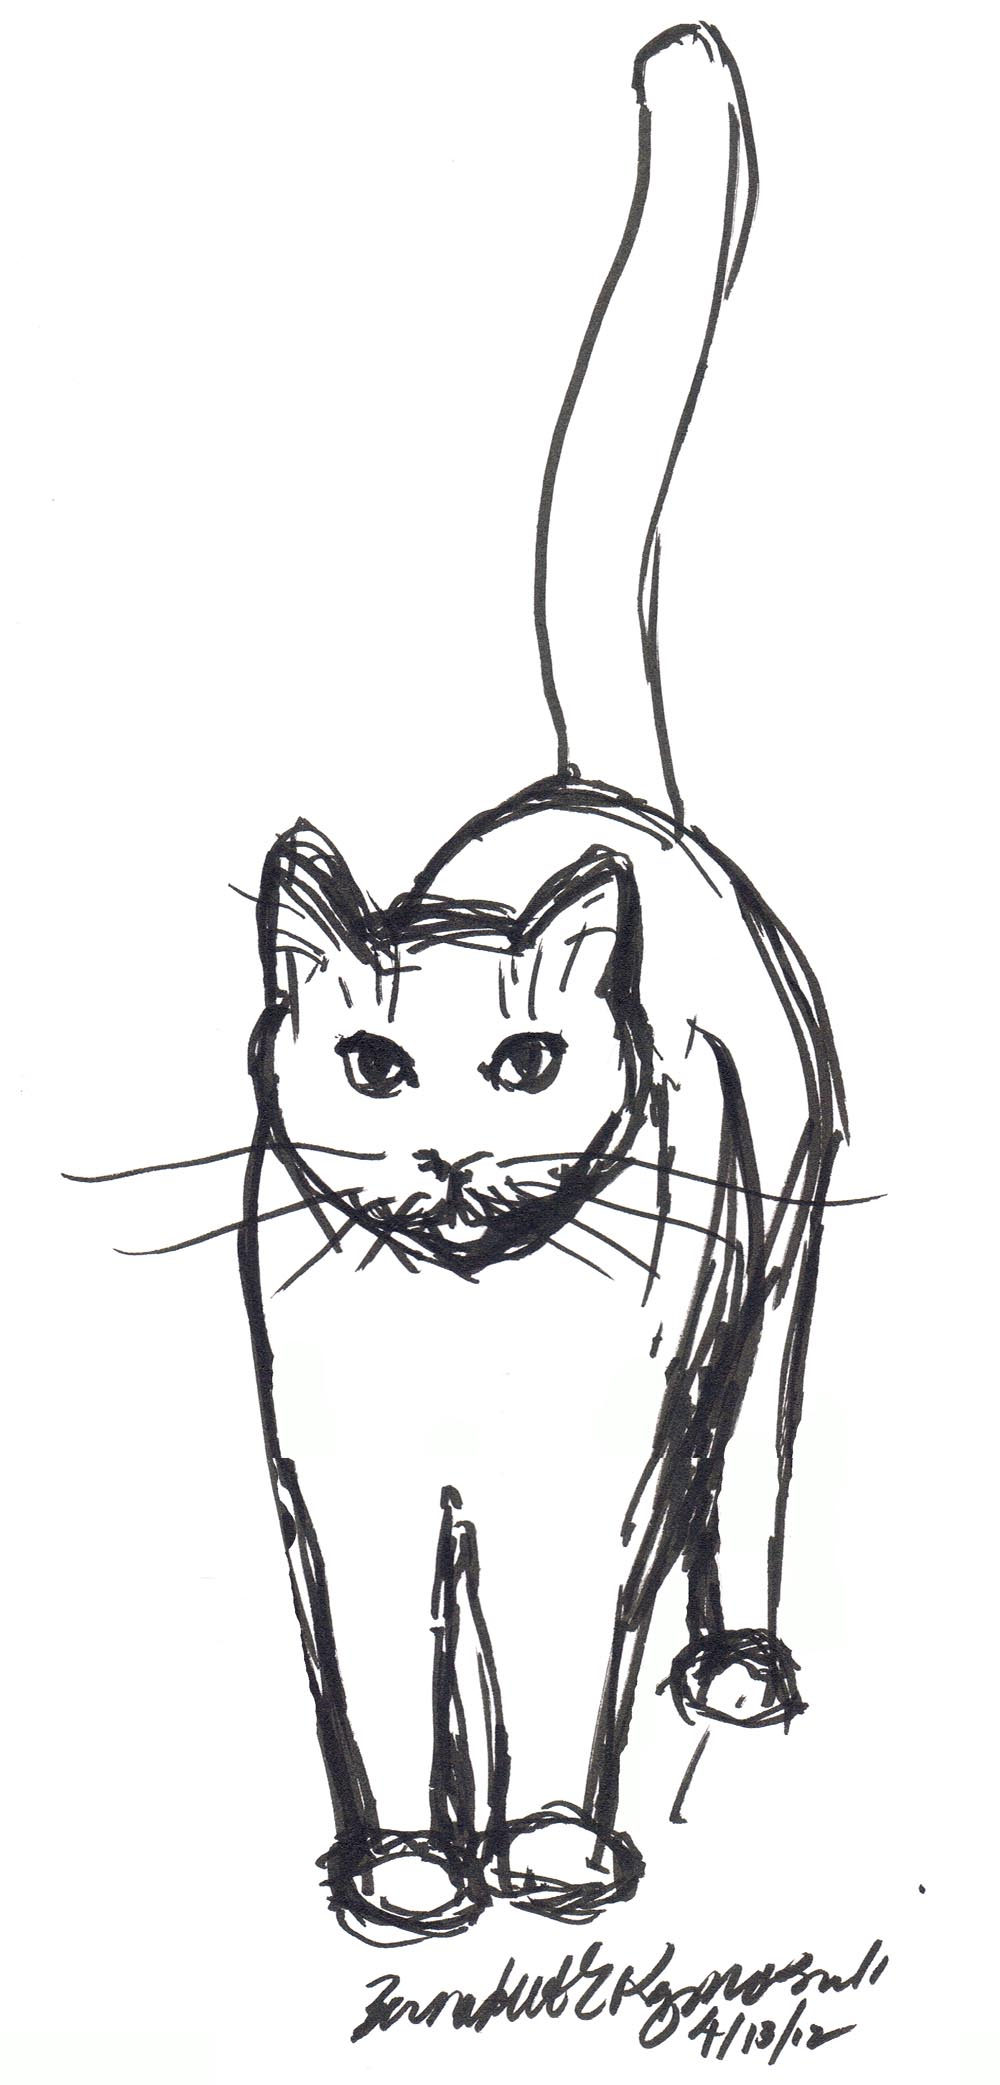 marker sketch of cat standing